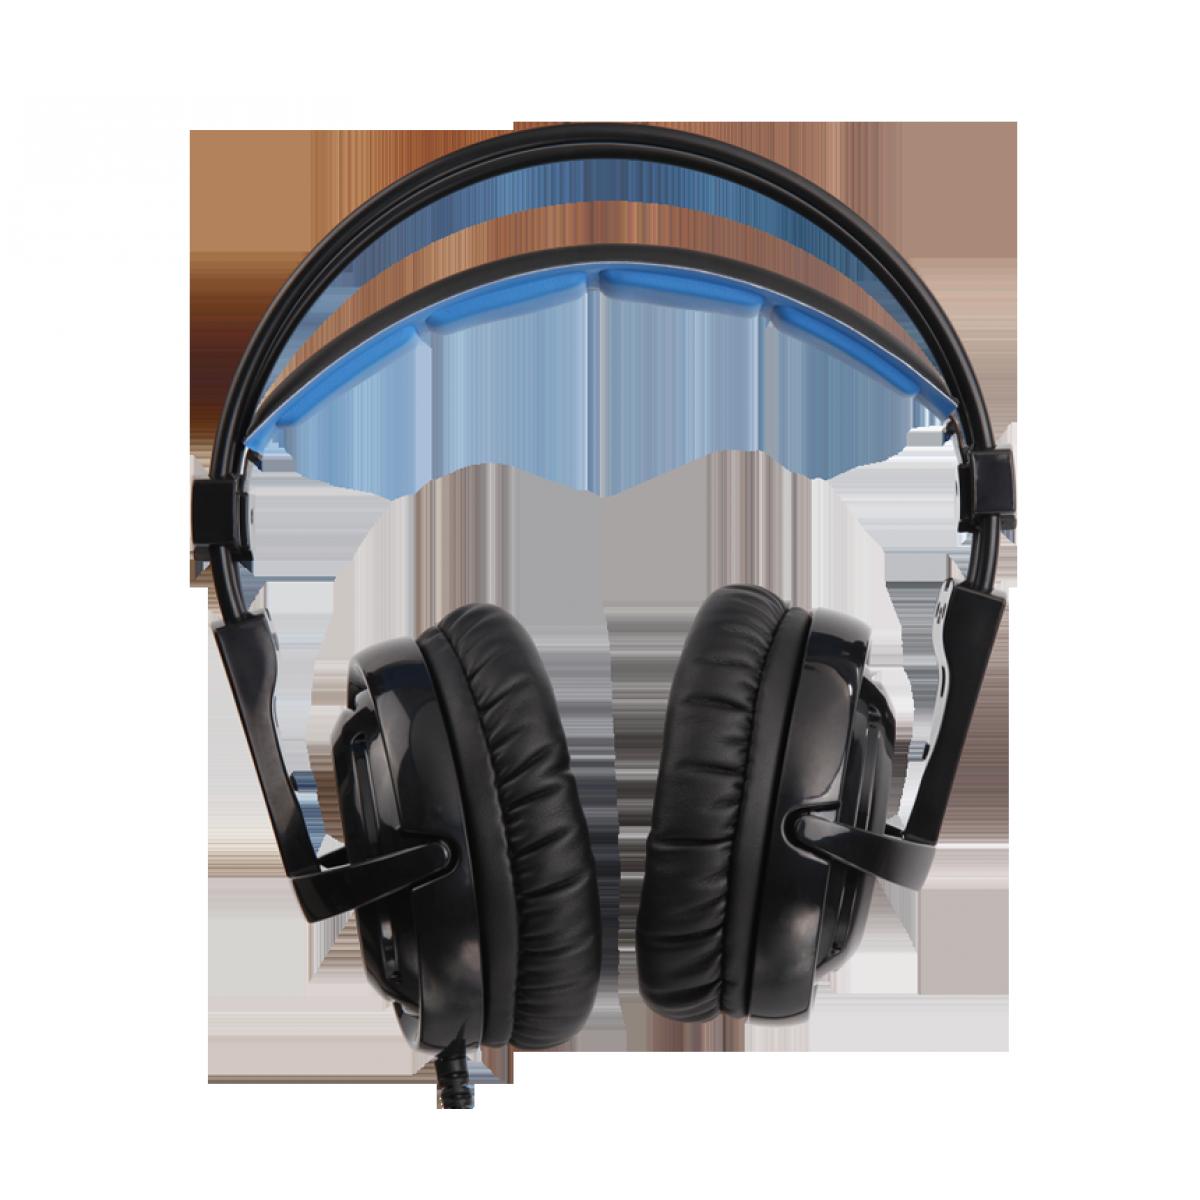 Headset Gamer Sades Sa-904 Locust Plus, RGB, 7.1 Surround, Black/Blue, Sa-904